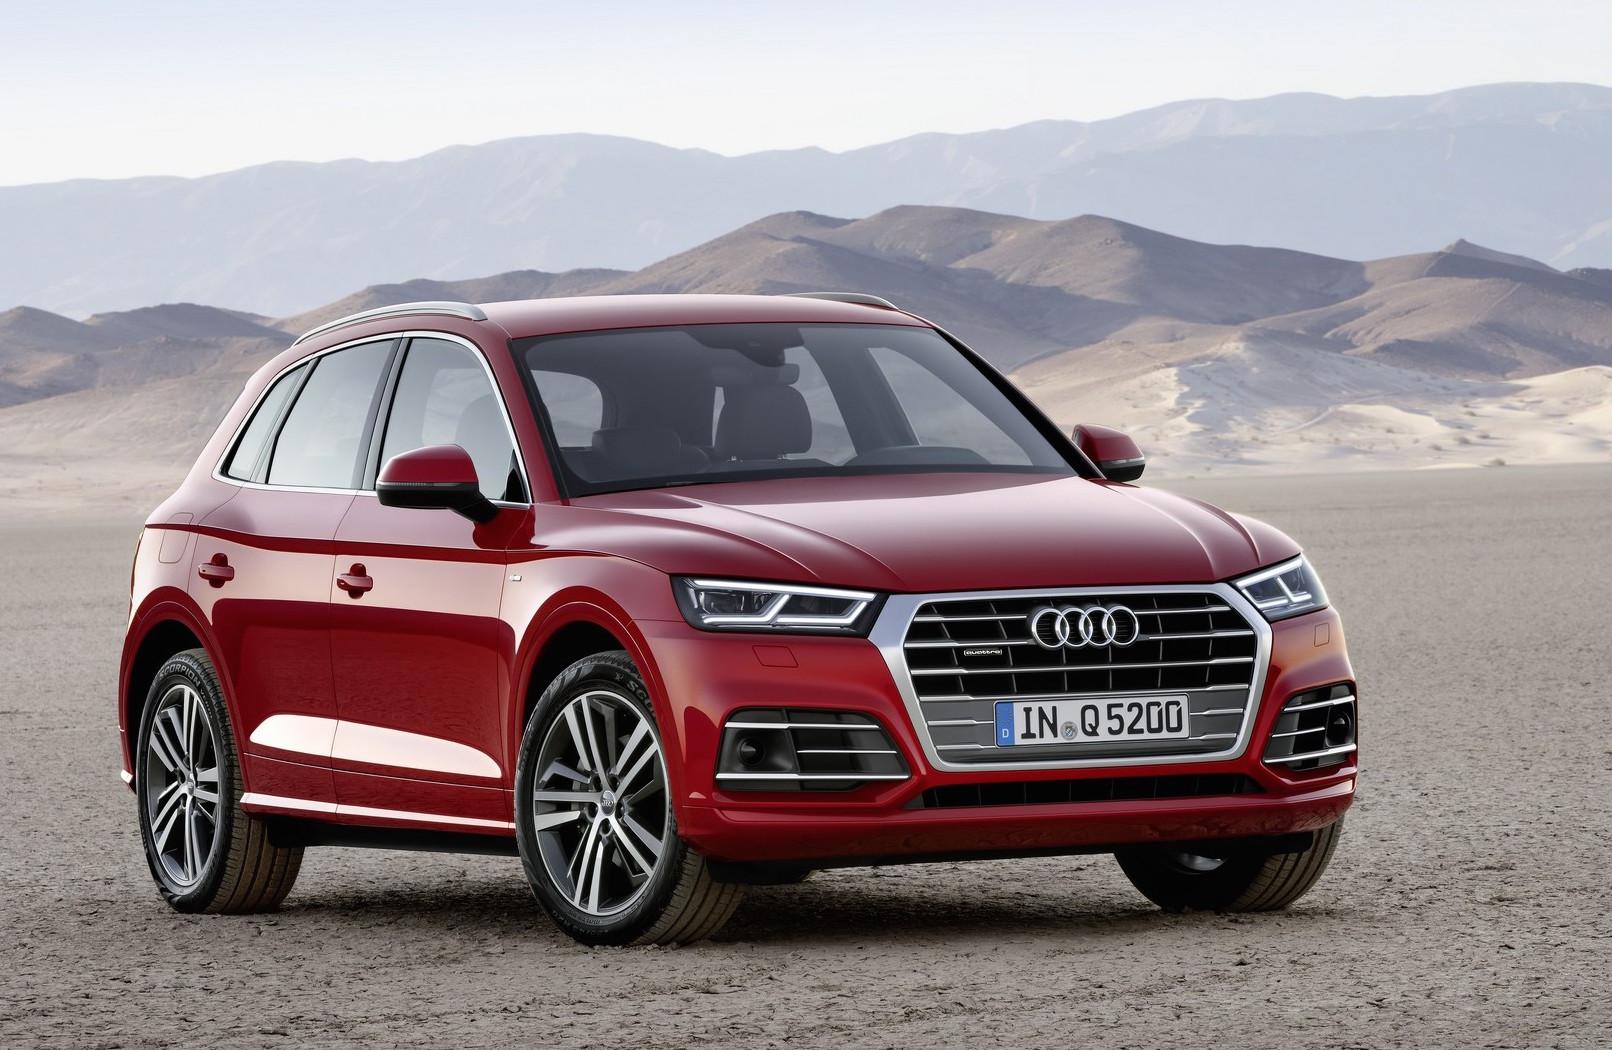 2017 Audi Q5 revealed at Paris show, up to 90kg lighter | PerformanceDrive